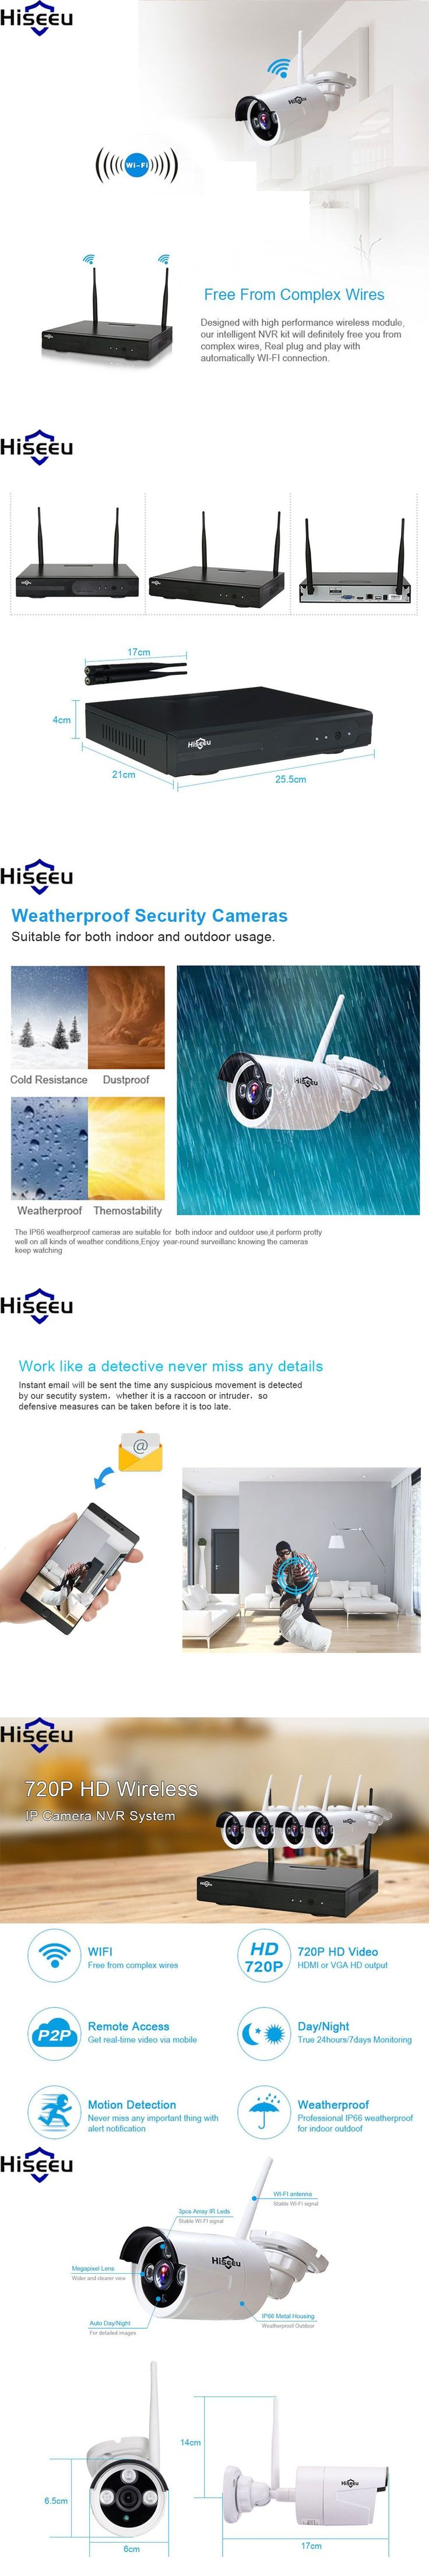 Hiseeu 4ch wifi NVR Wireless NVR IP Camera 720P Wireless CCTV System Set CCTV Camera Home Security System Surveillance Kit #homesecuritysystemcameras